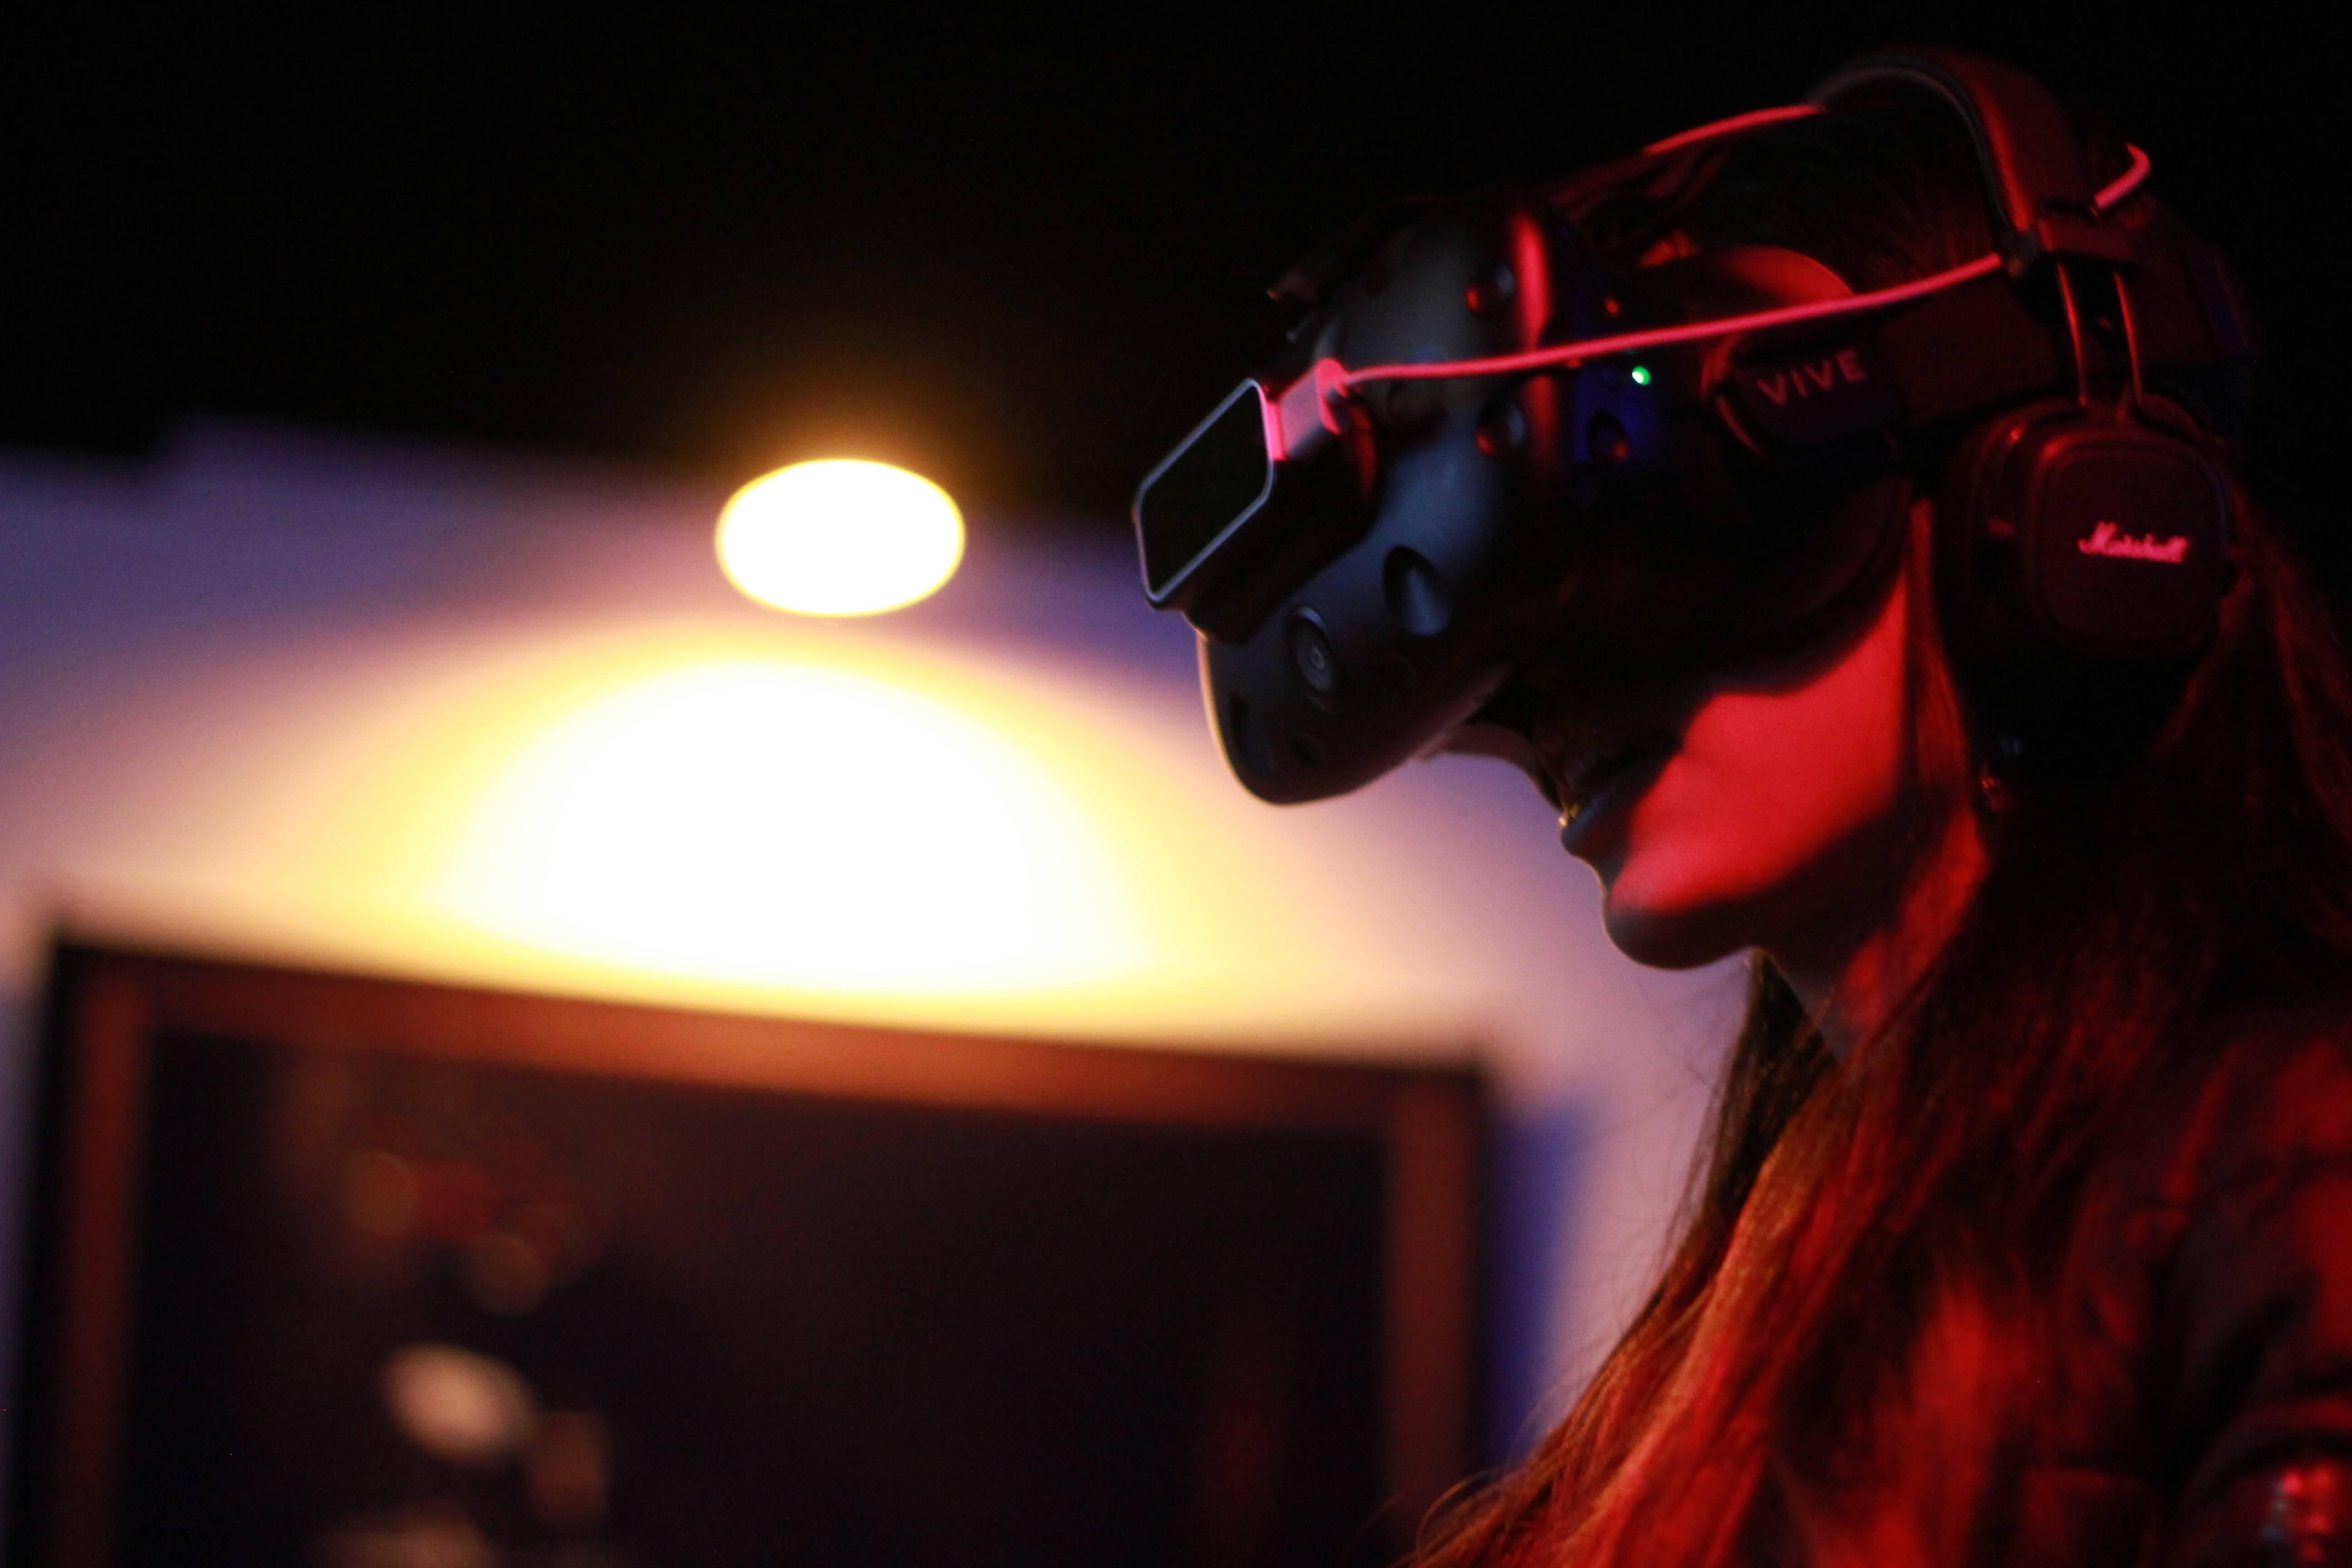 Recto VRso virtual gallery at Vancouver